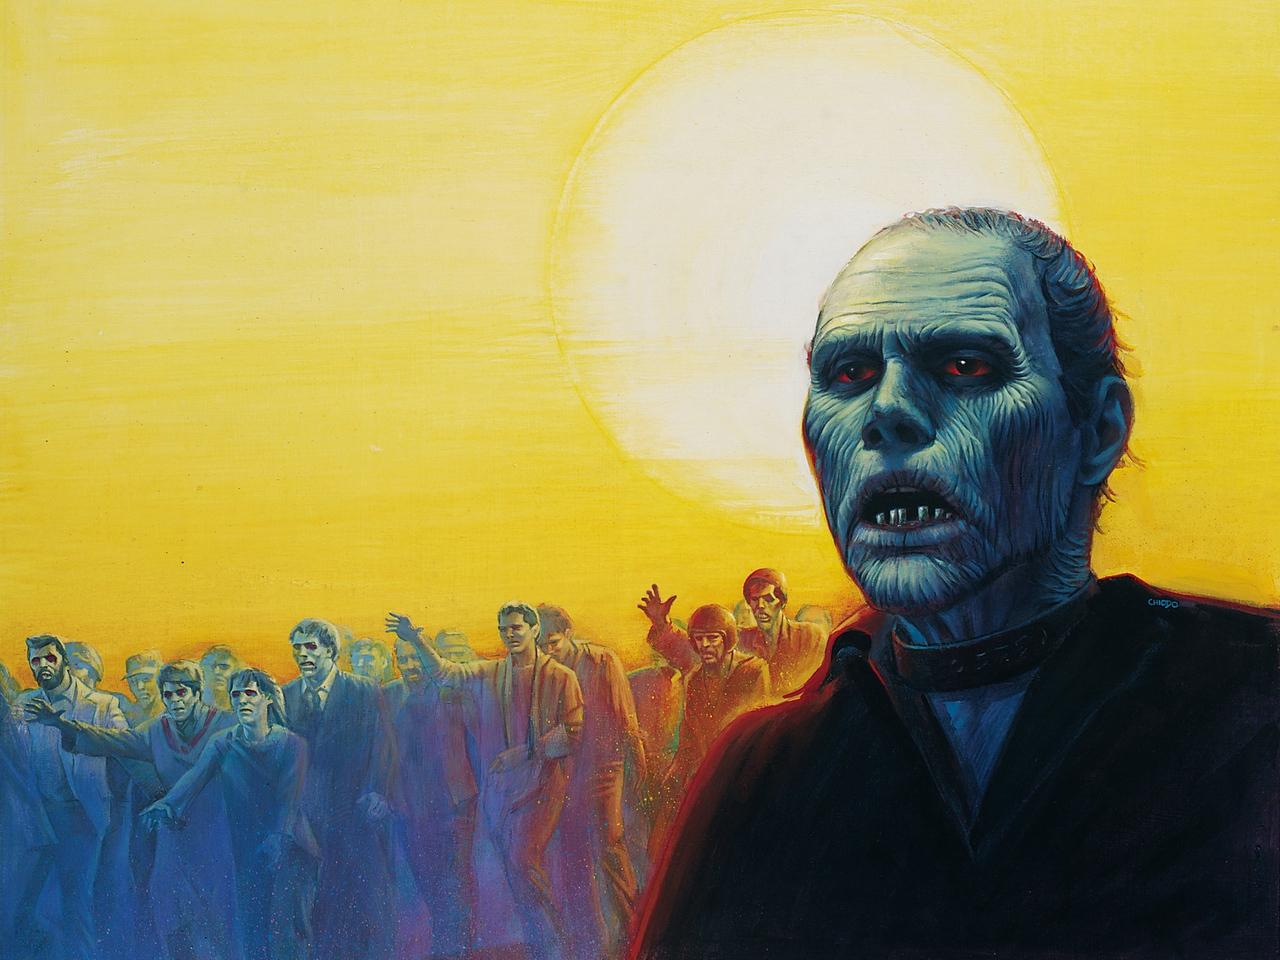 day of the dead, 1985, art, zombie wallpaper,